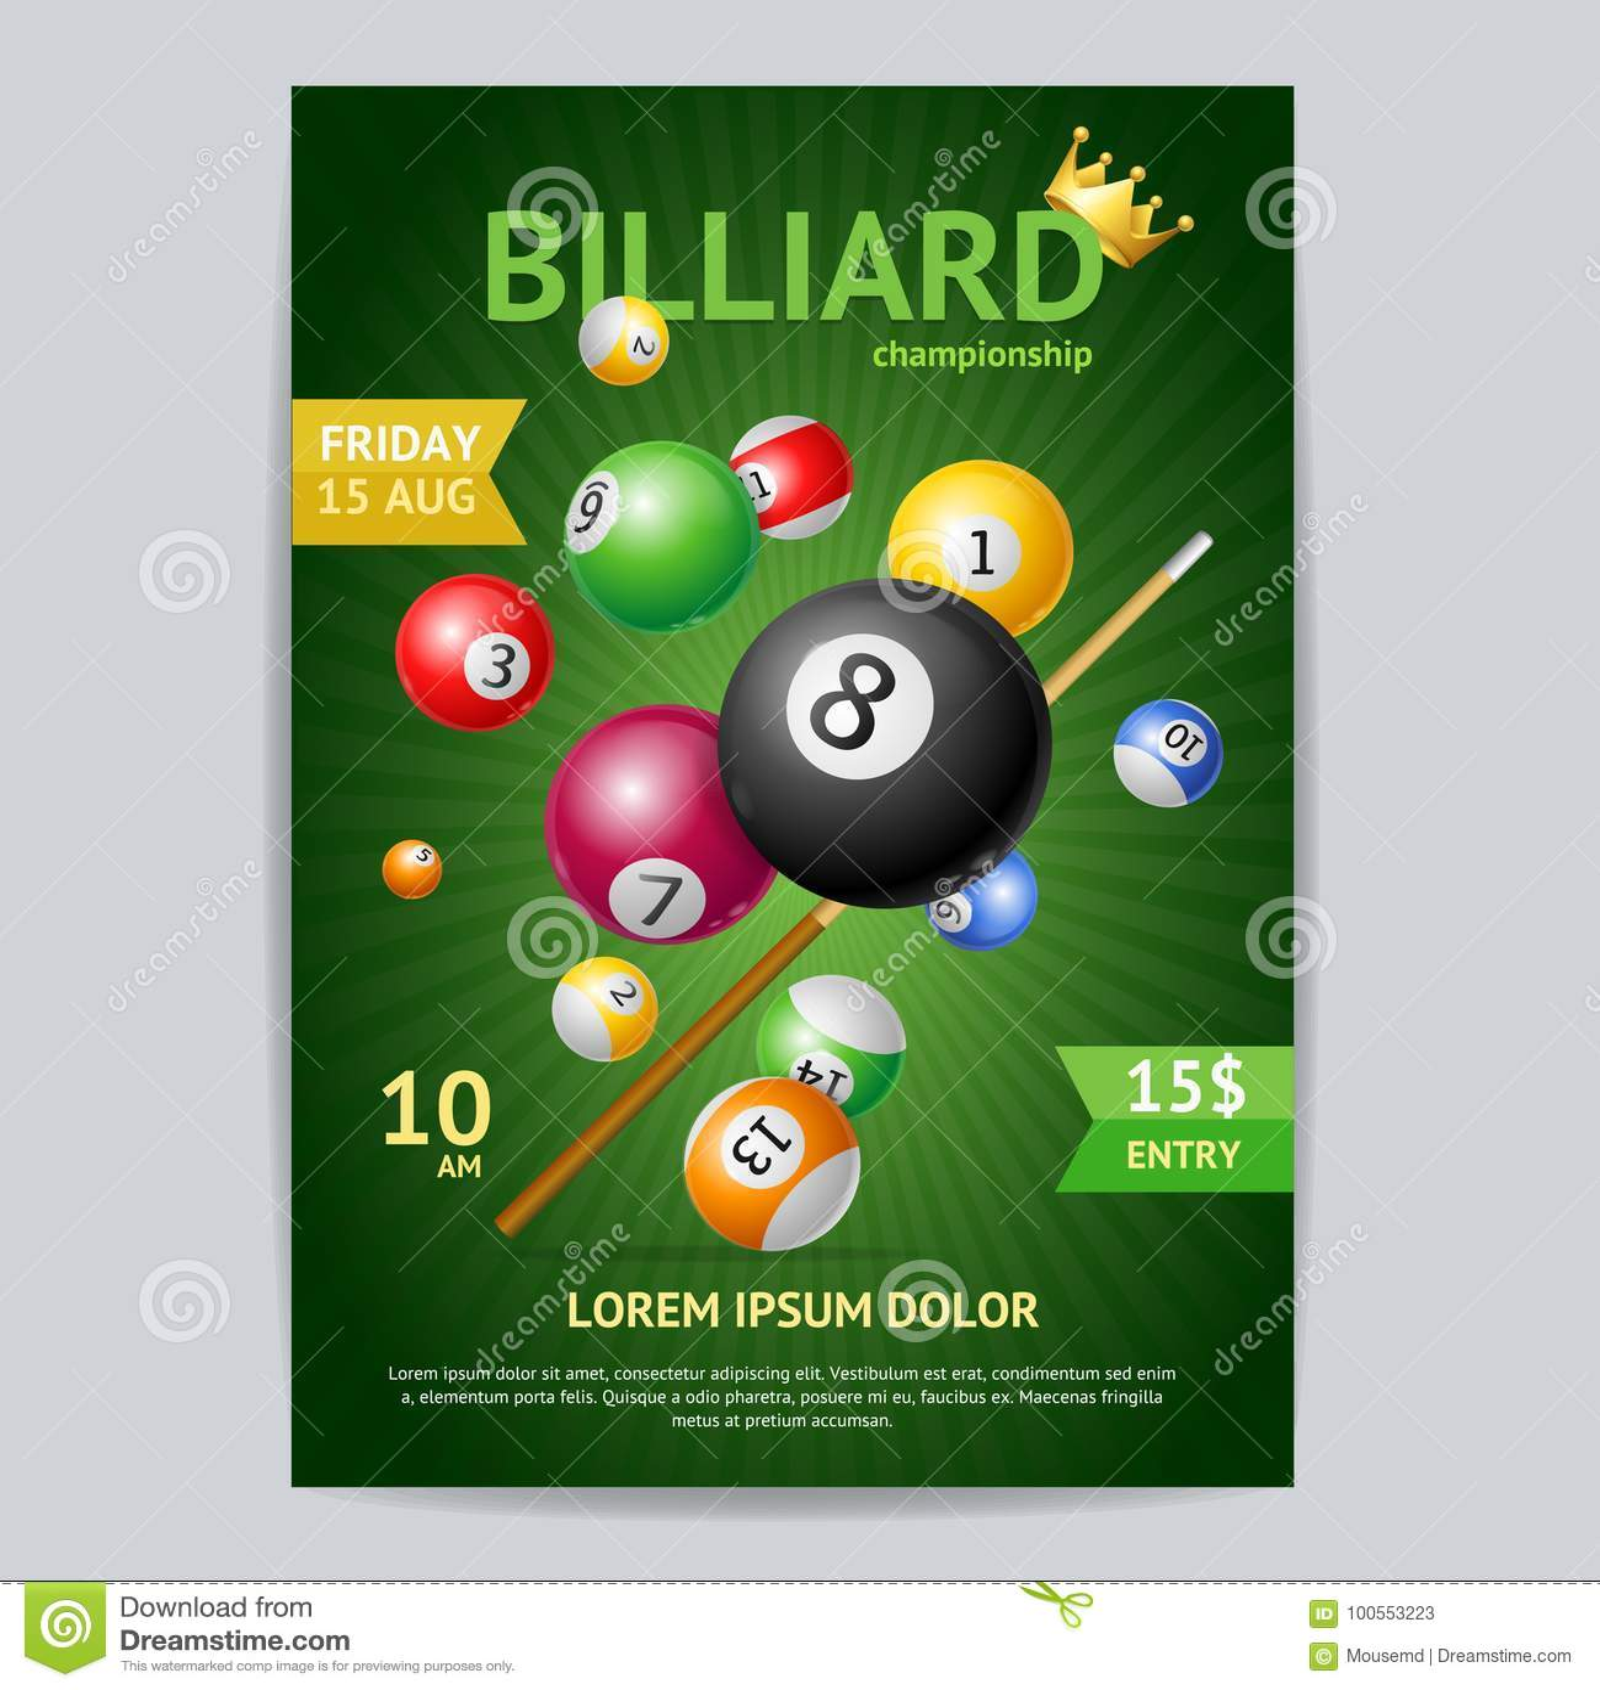 Billard-Turnier-Plakat-Karten-Schablone Vektor Vektor Abbildung ...